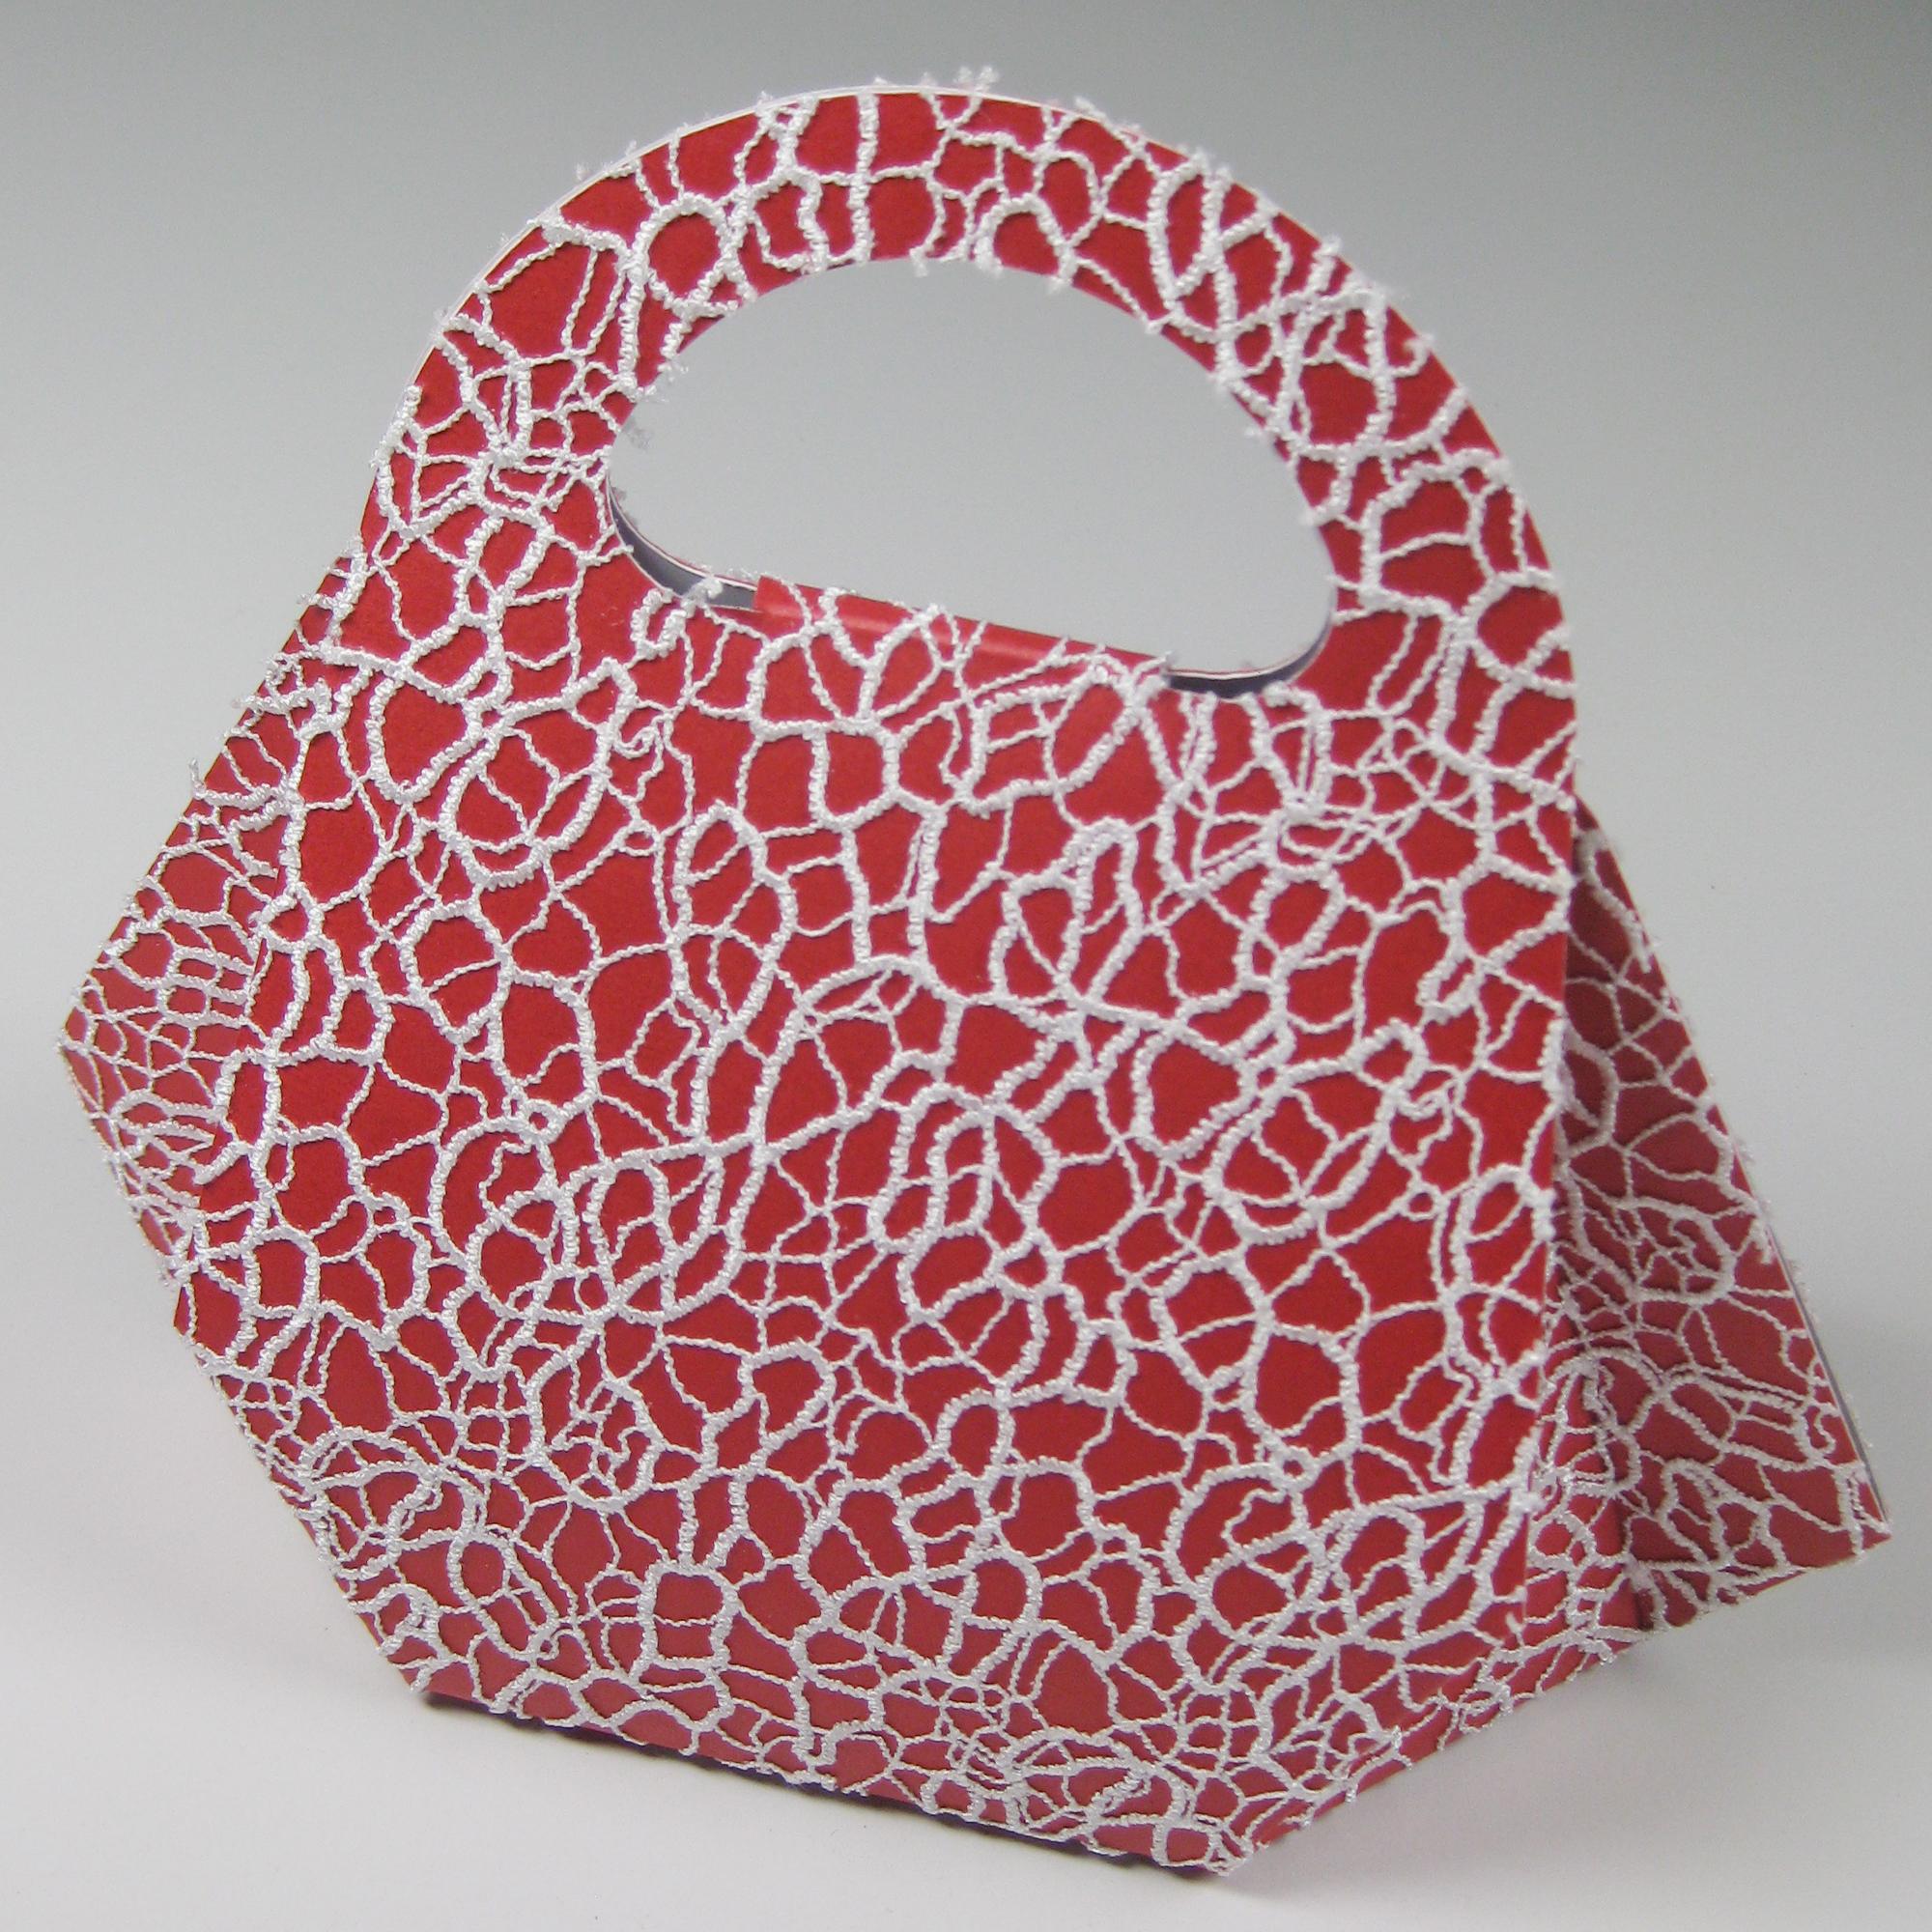 Bischoff Textil AG - Verpackung